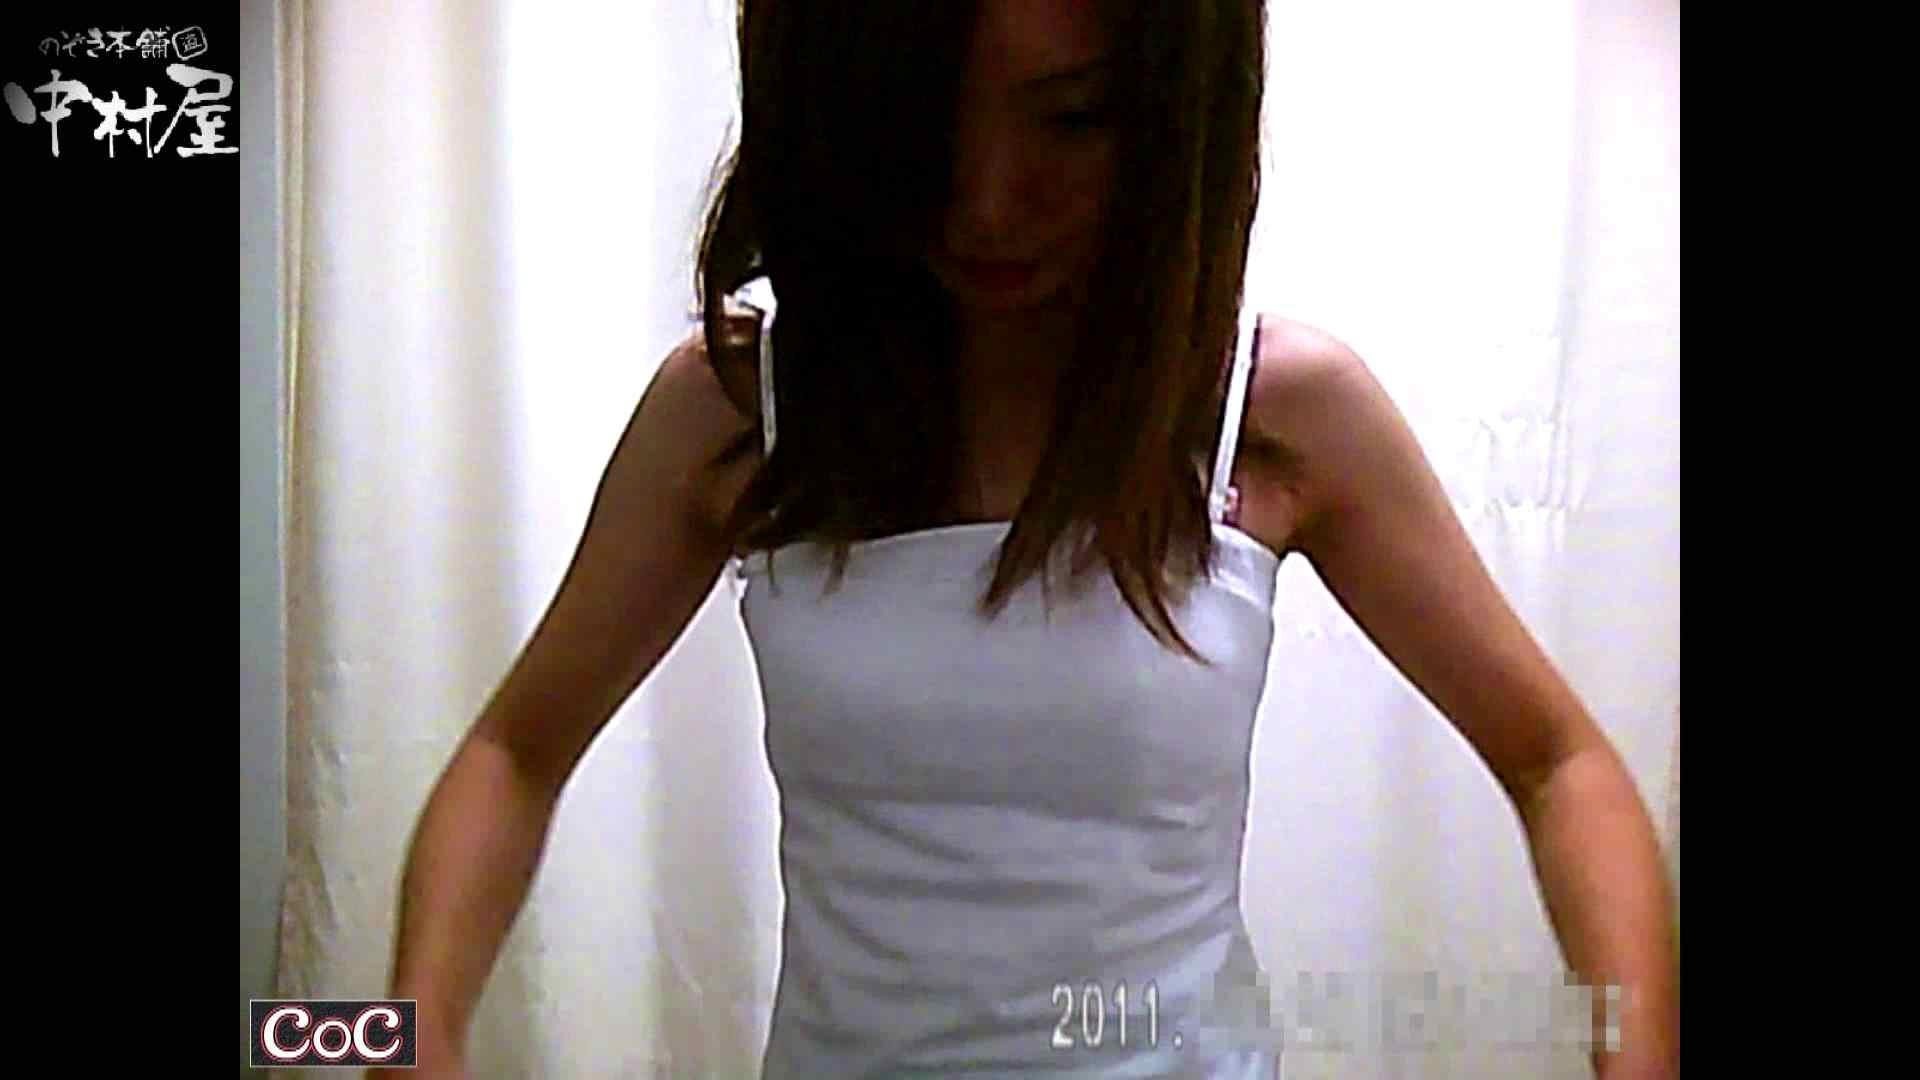 Doctor-X元医者による反抗vol.64後編 おまんこ見放題 | 盗撮シリーズ  104PIX 23